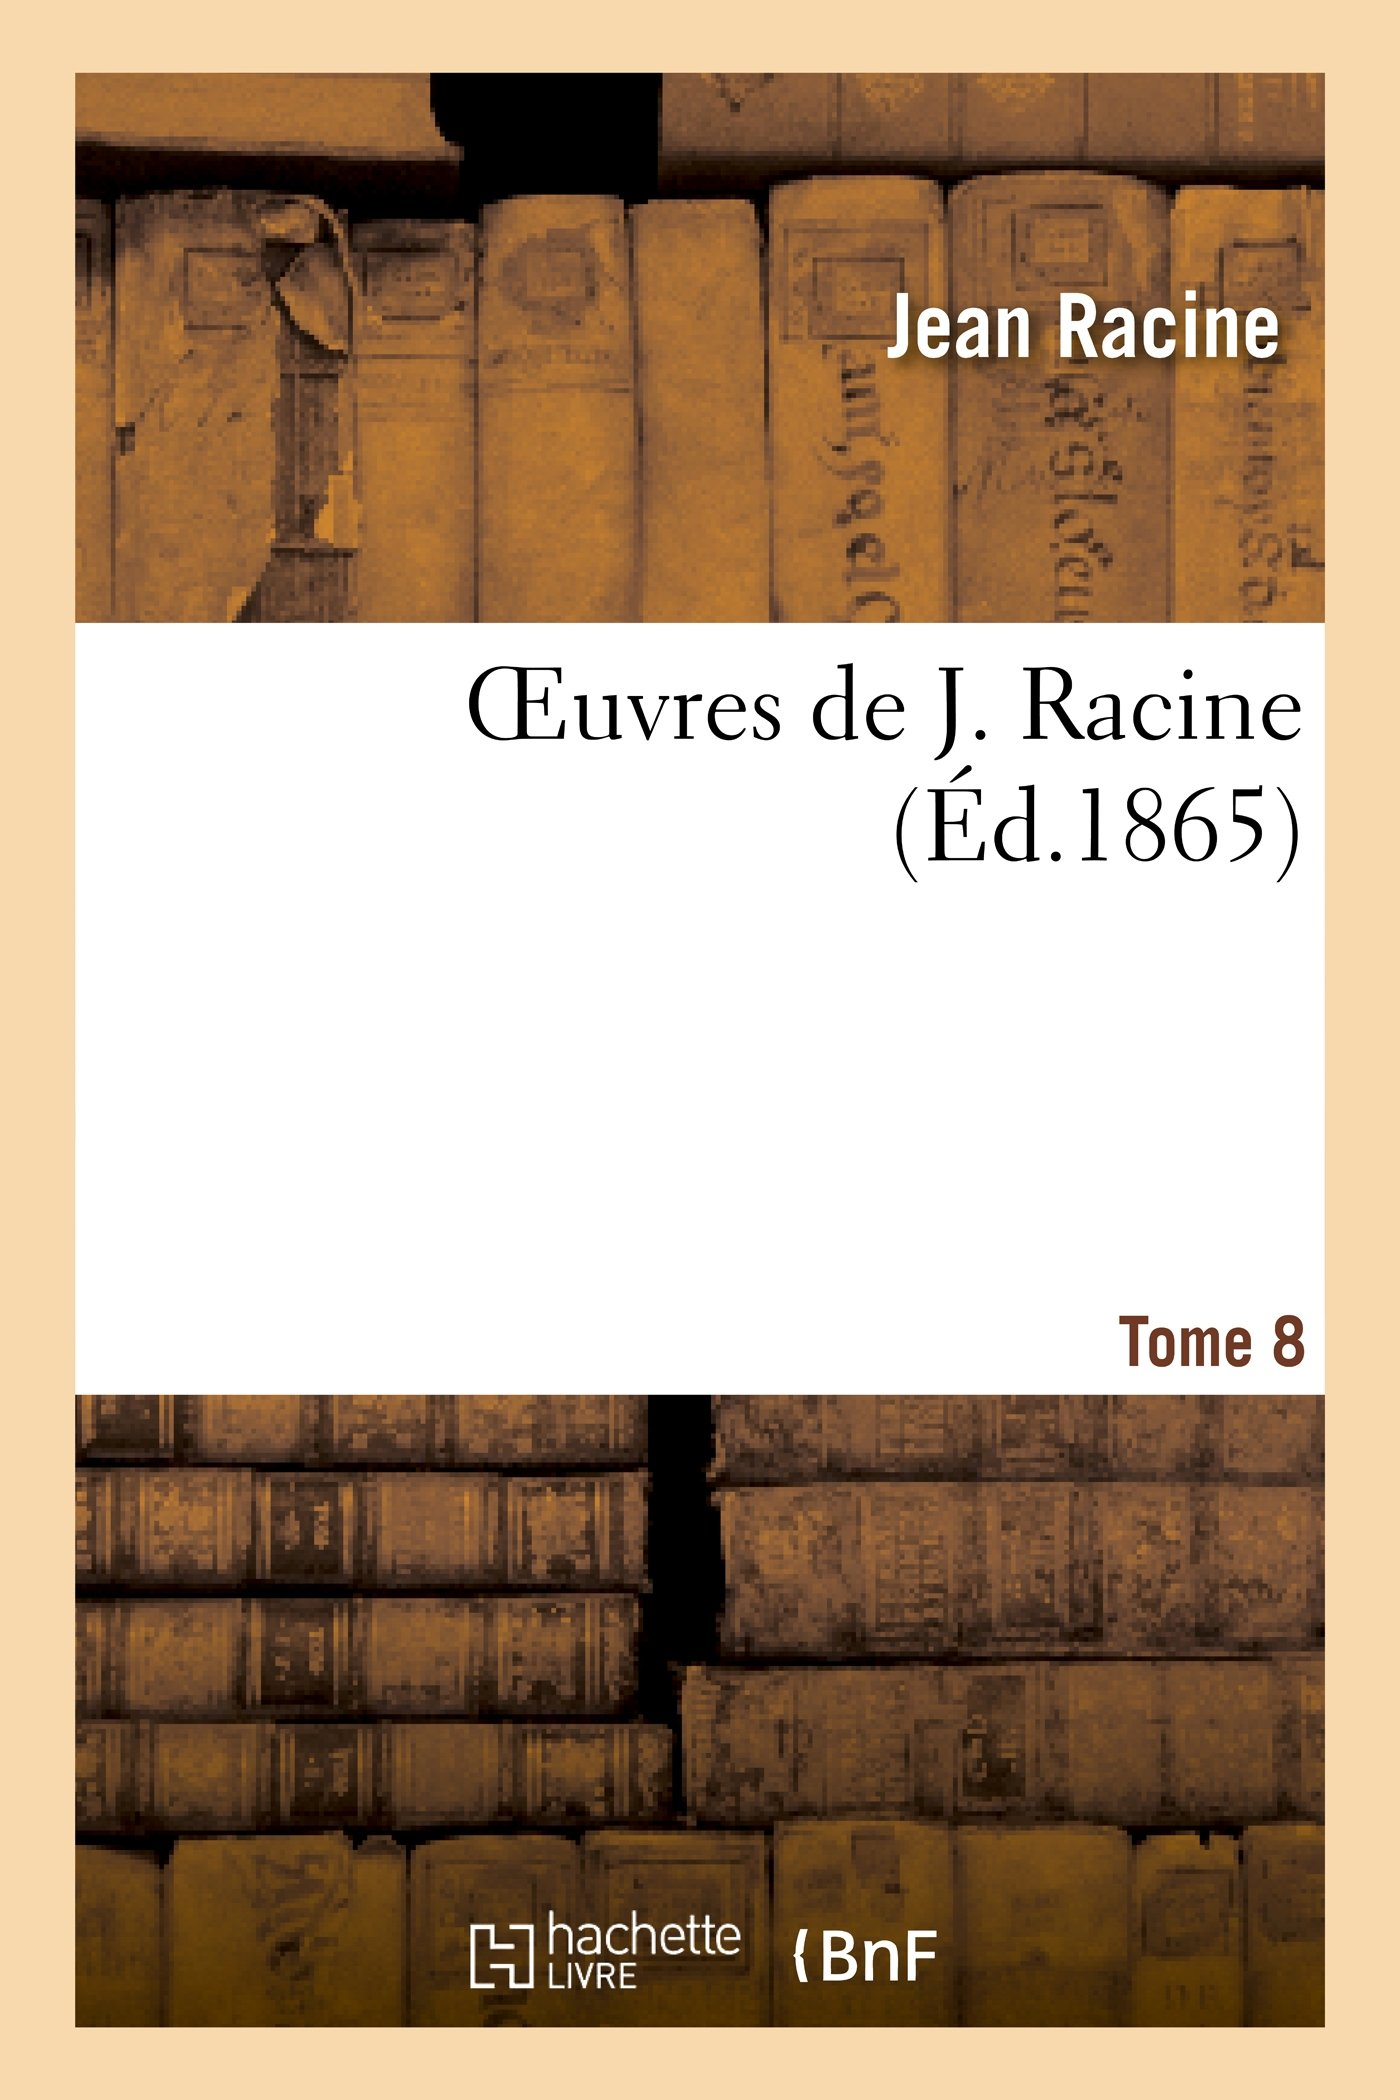 Oeuvres de J. Racine.Tome 8 (Litterature) (French Edition) pdf epub